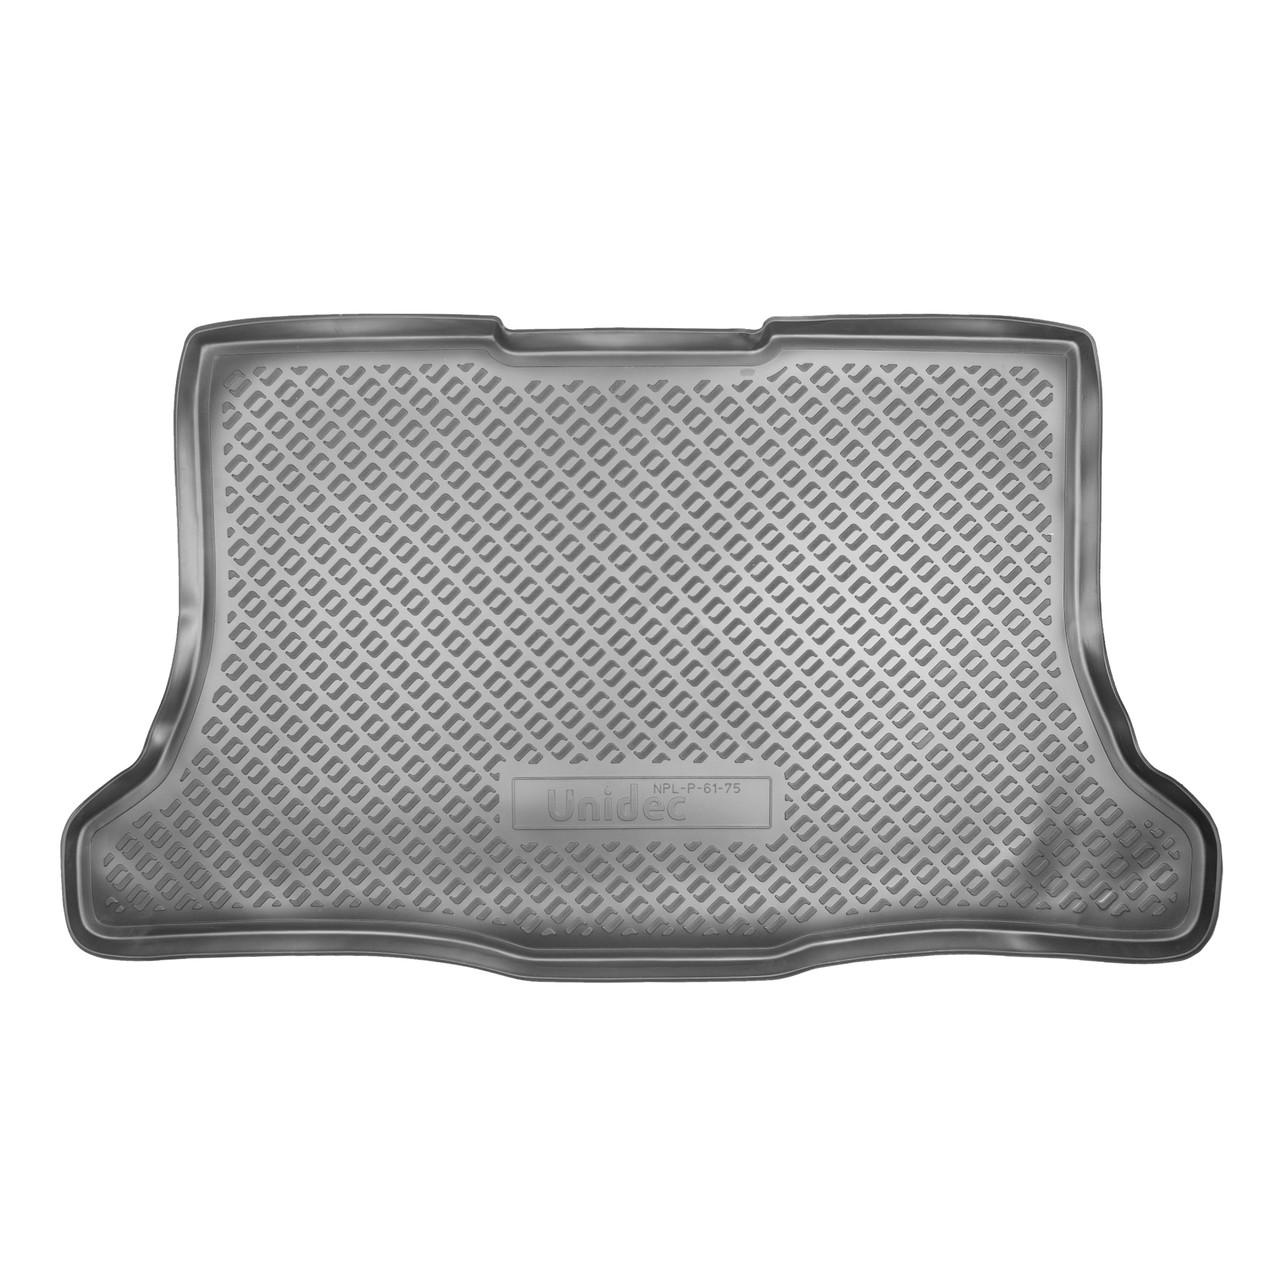 Коврик в багажник Nissan Tiida HB (2007)